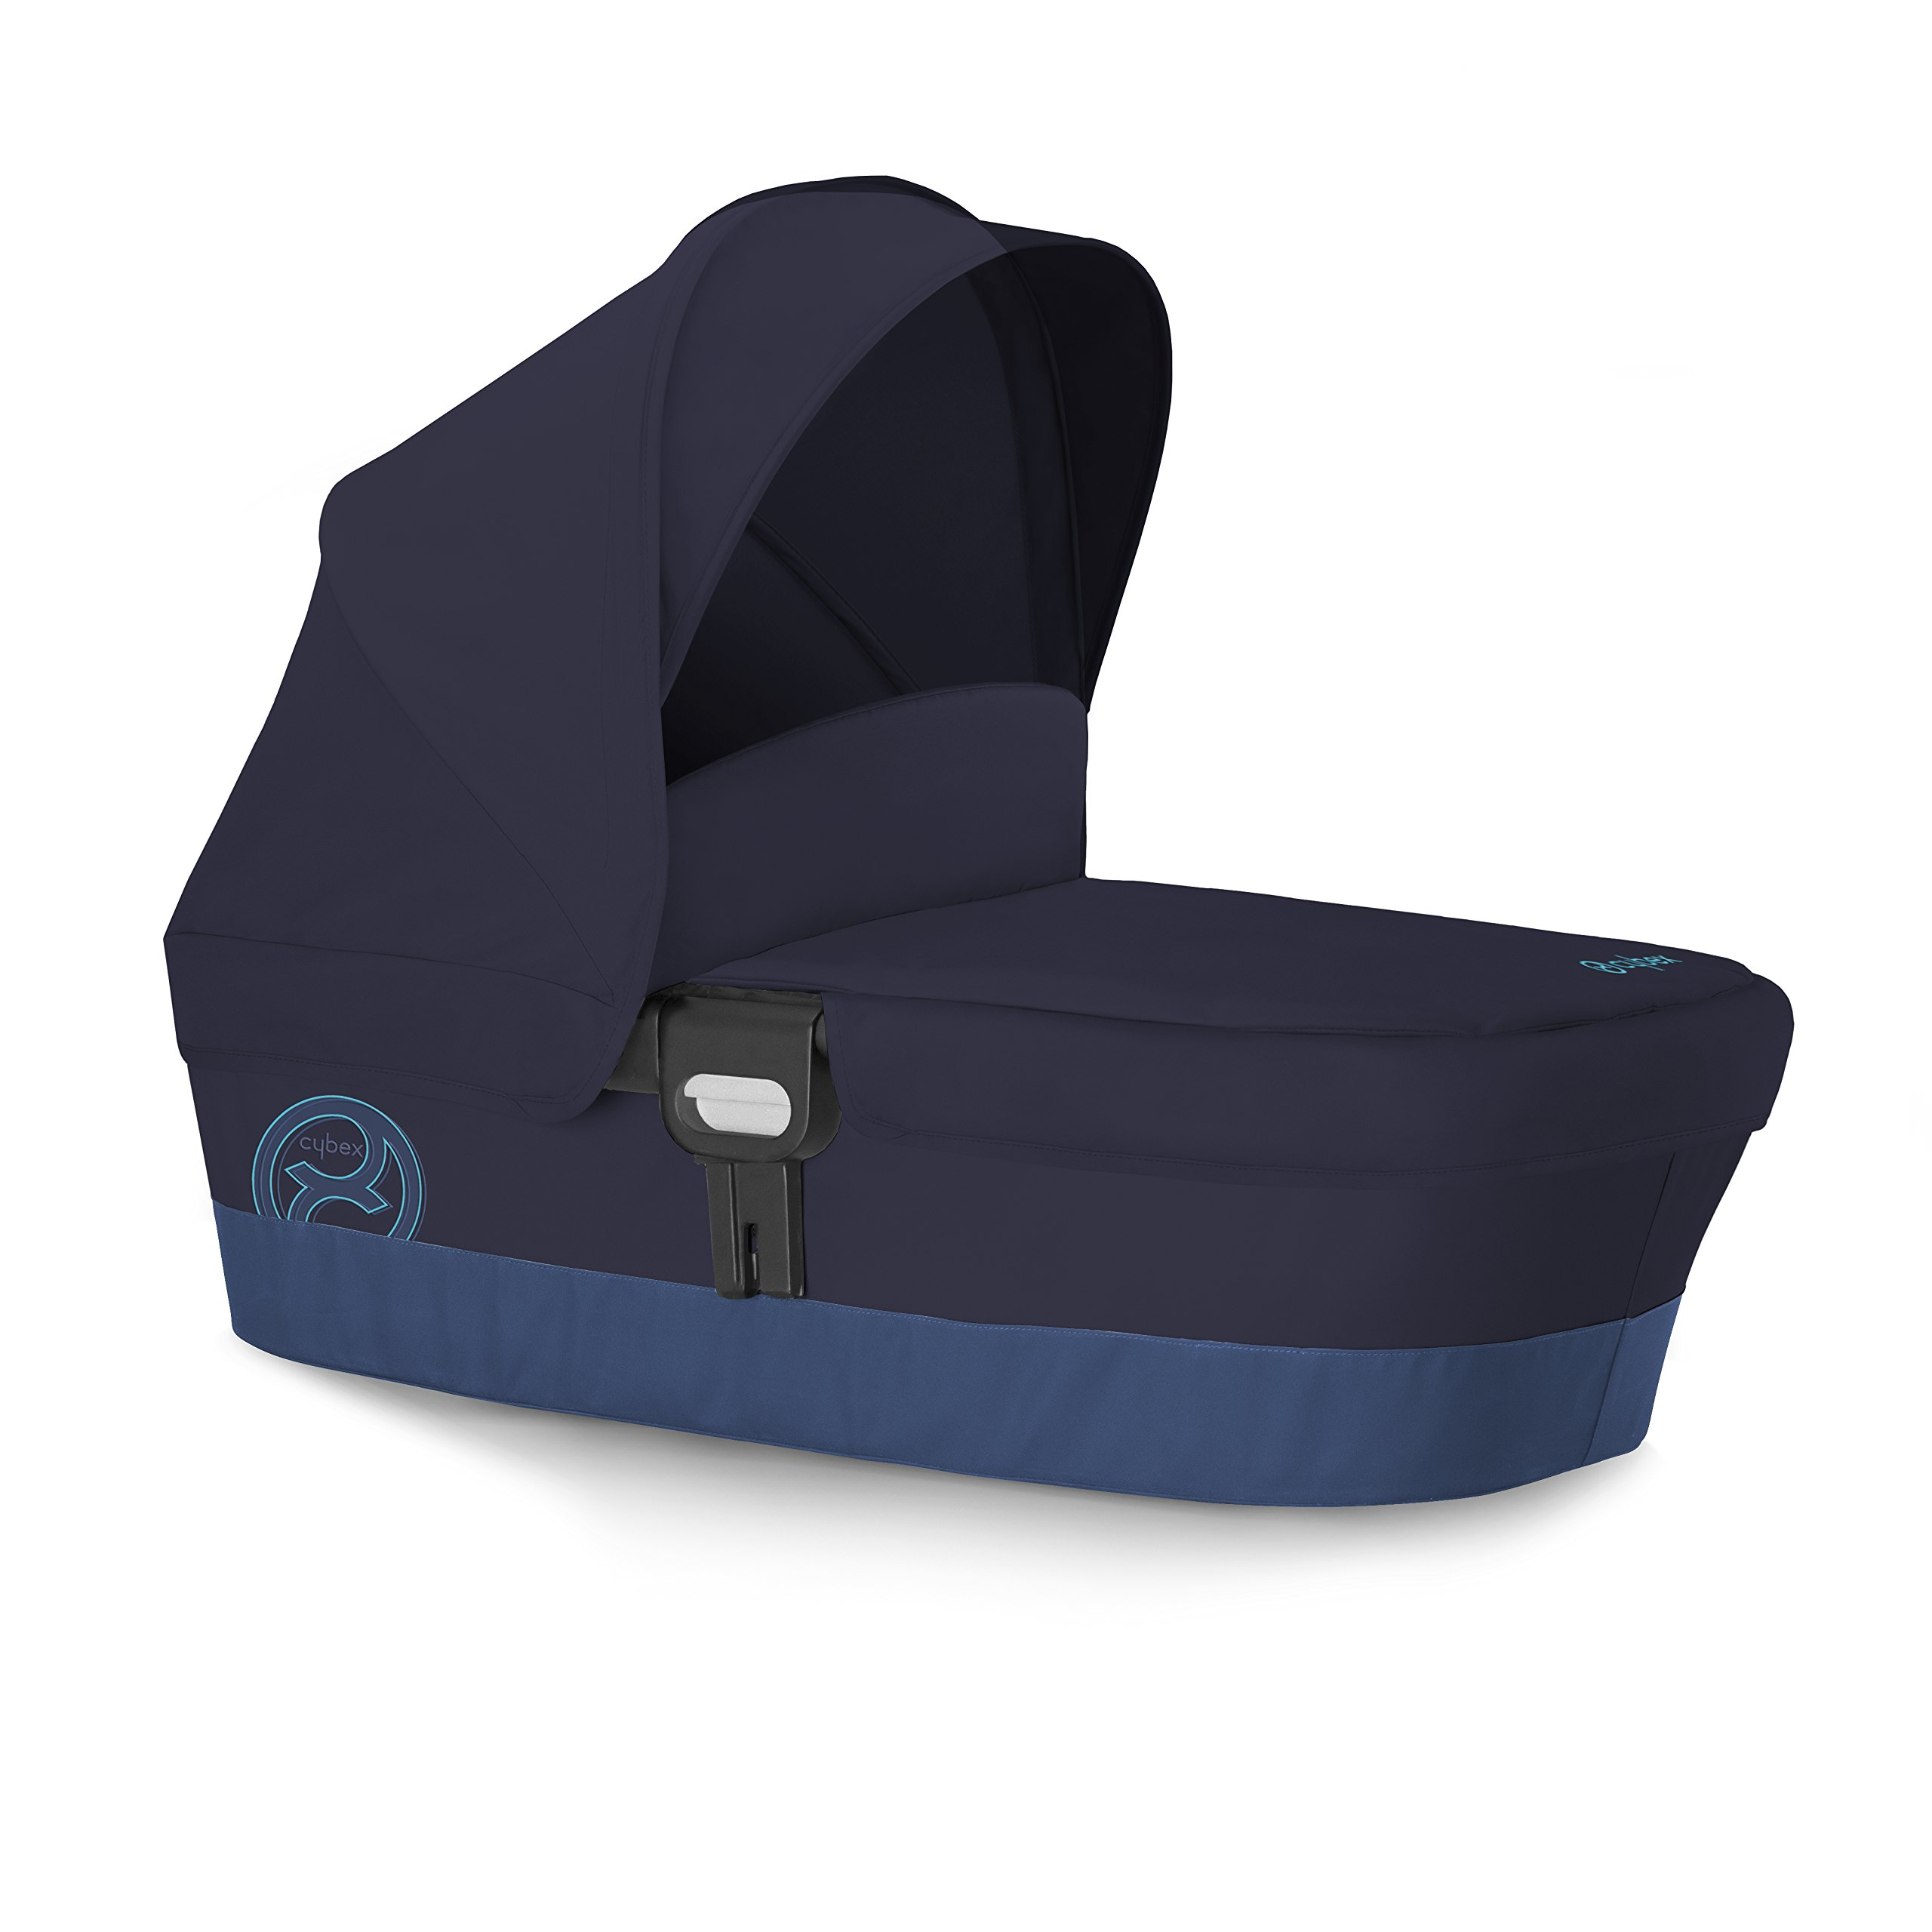 CYBEX Carry Cot M Stroller, True Blue